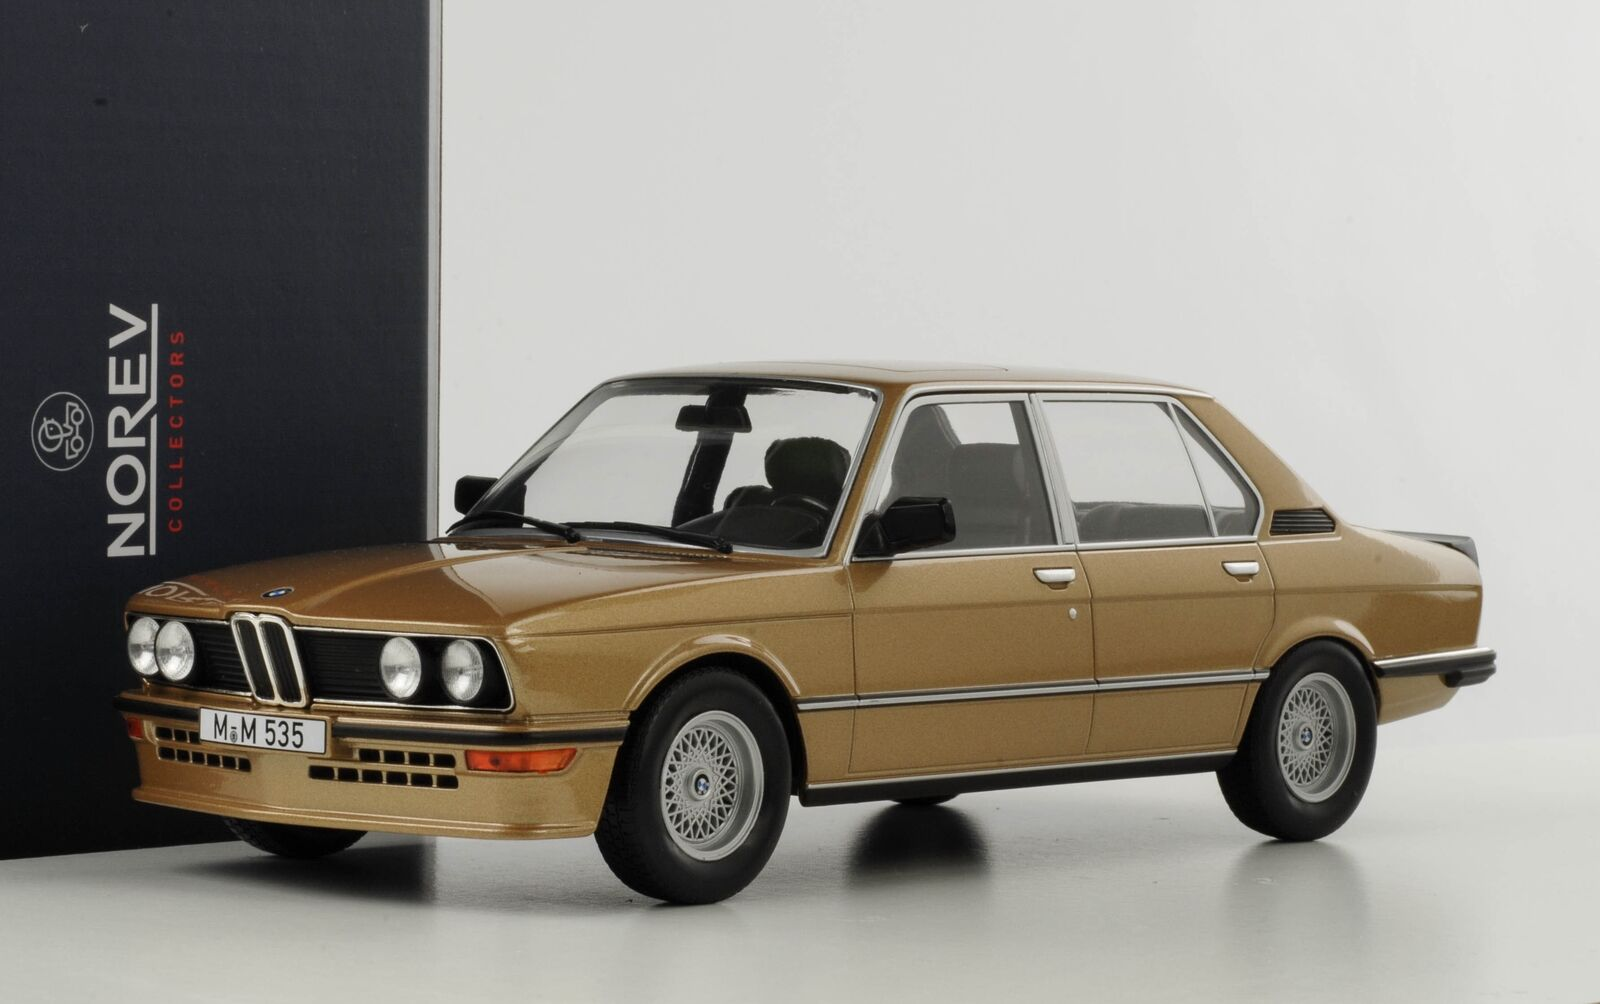 1980 BMW 535i M535i E12 golden Metallic 1 18 Norev 183268